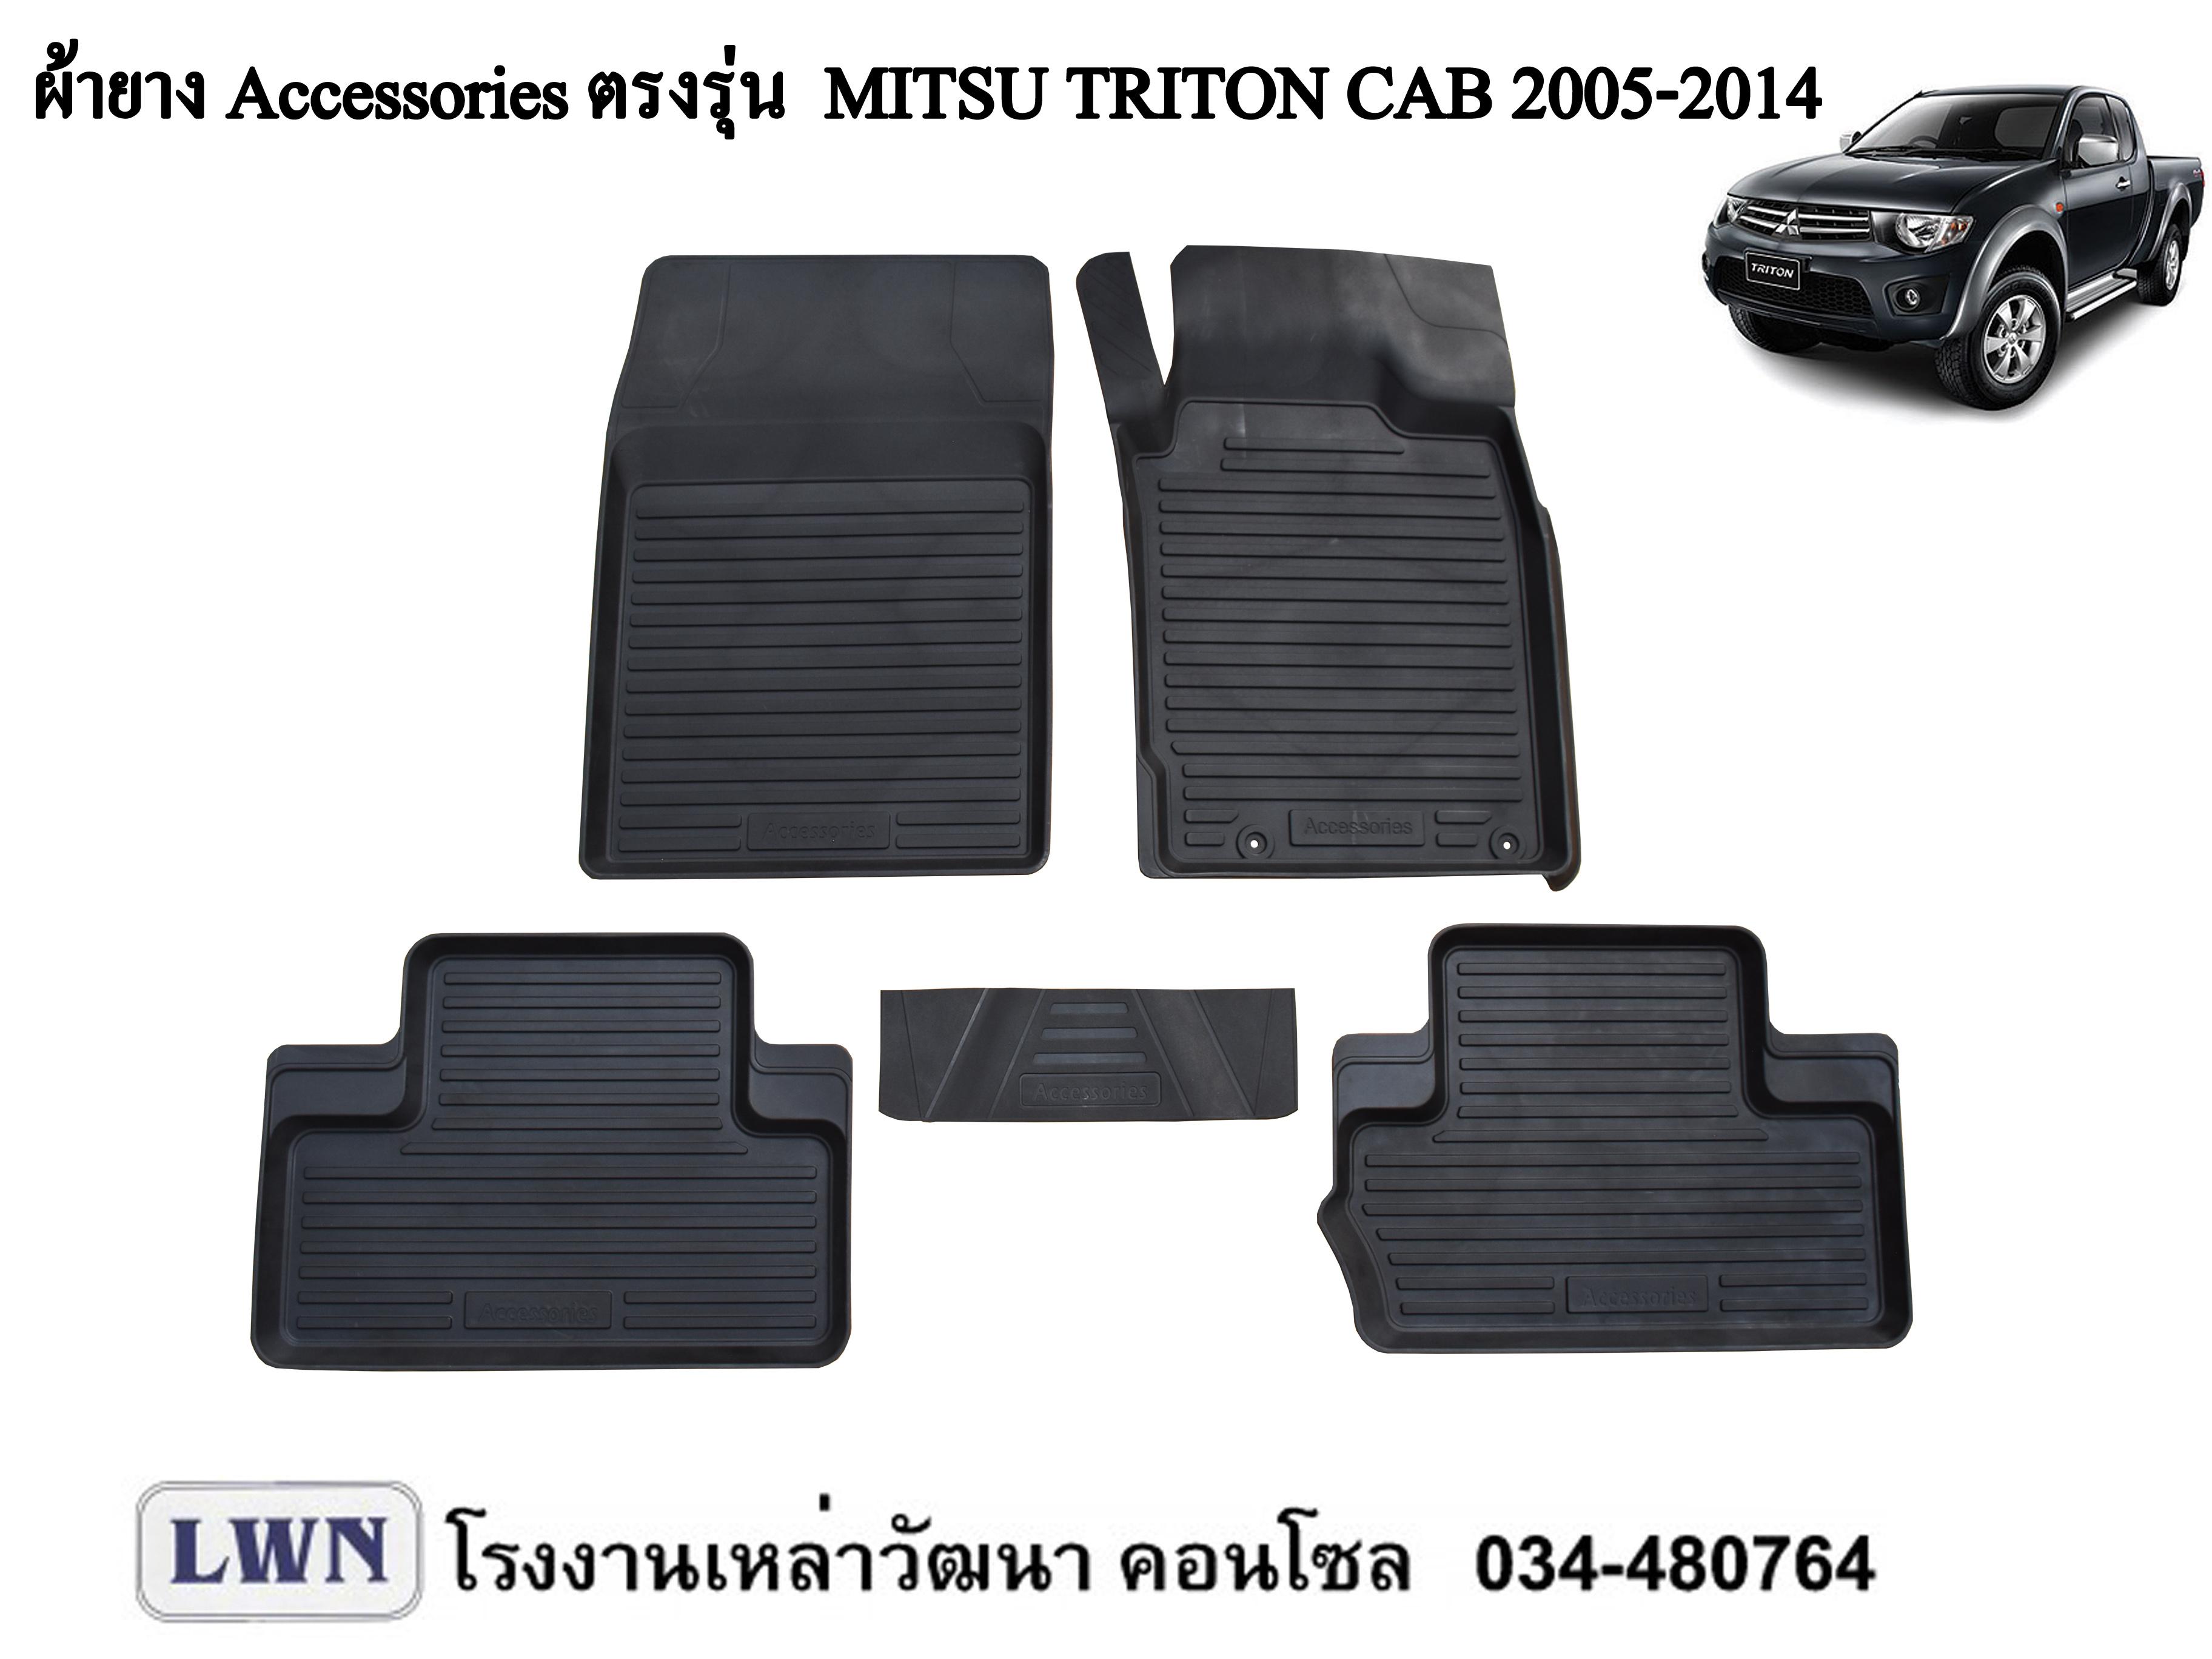 ACC-Mitsu Trition Single Cab